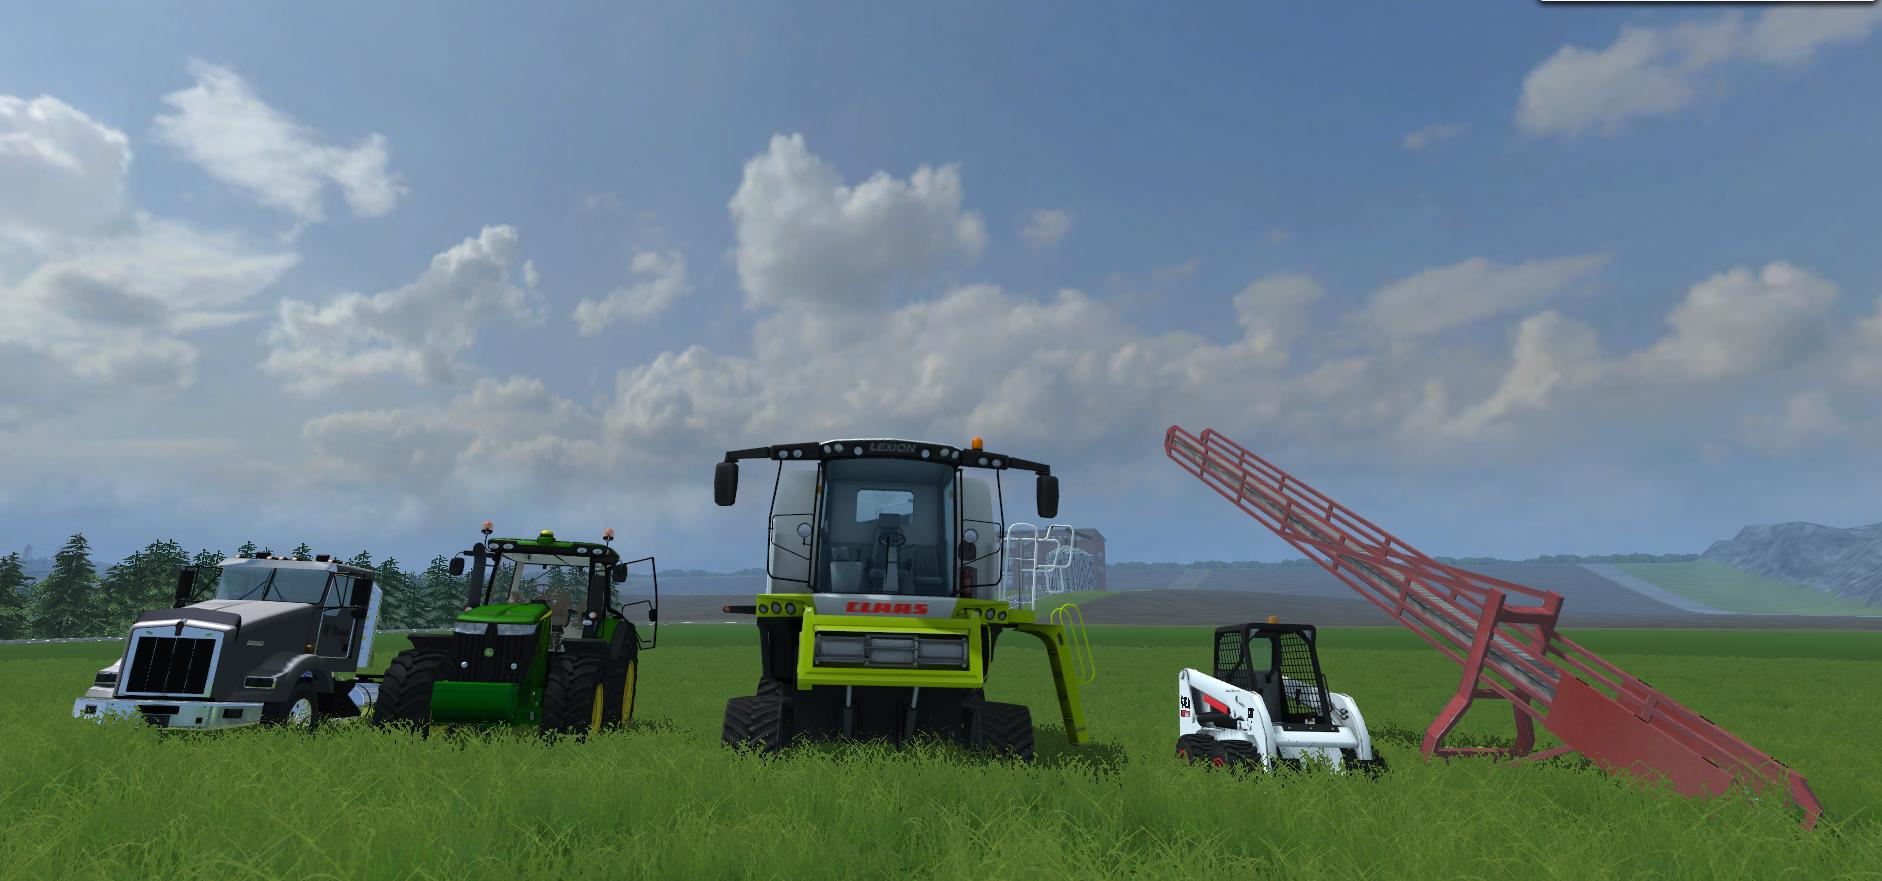 Top 5 Farming Simulator 2013 Mods - Iain Robson